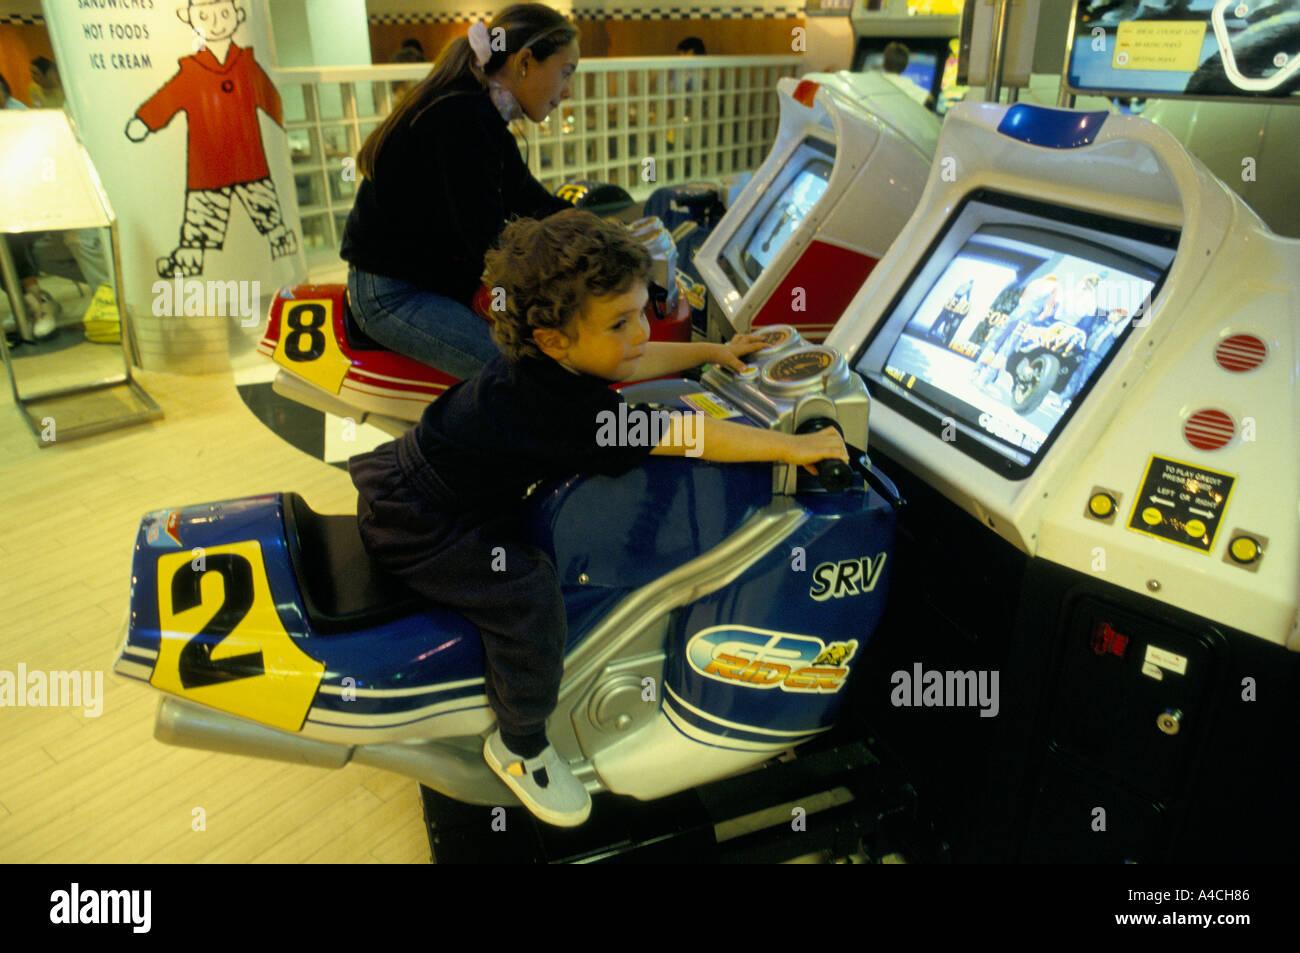 the sega games floor at hamleys toy shop in london 8 93 virtual reality racing games - Stock Image